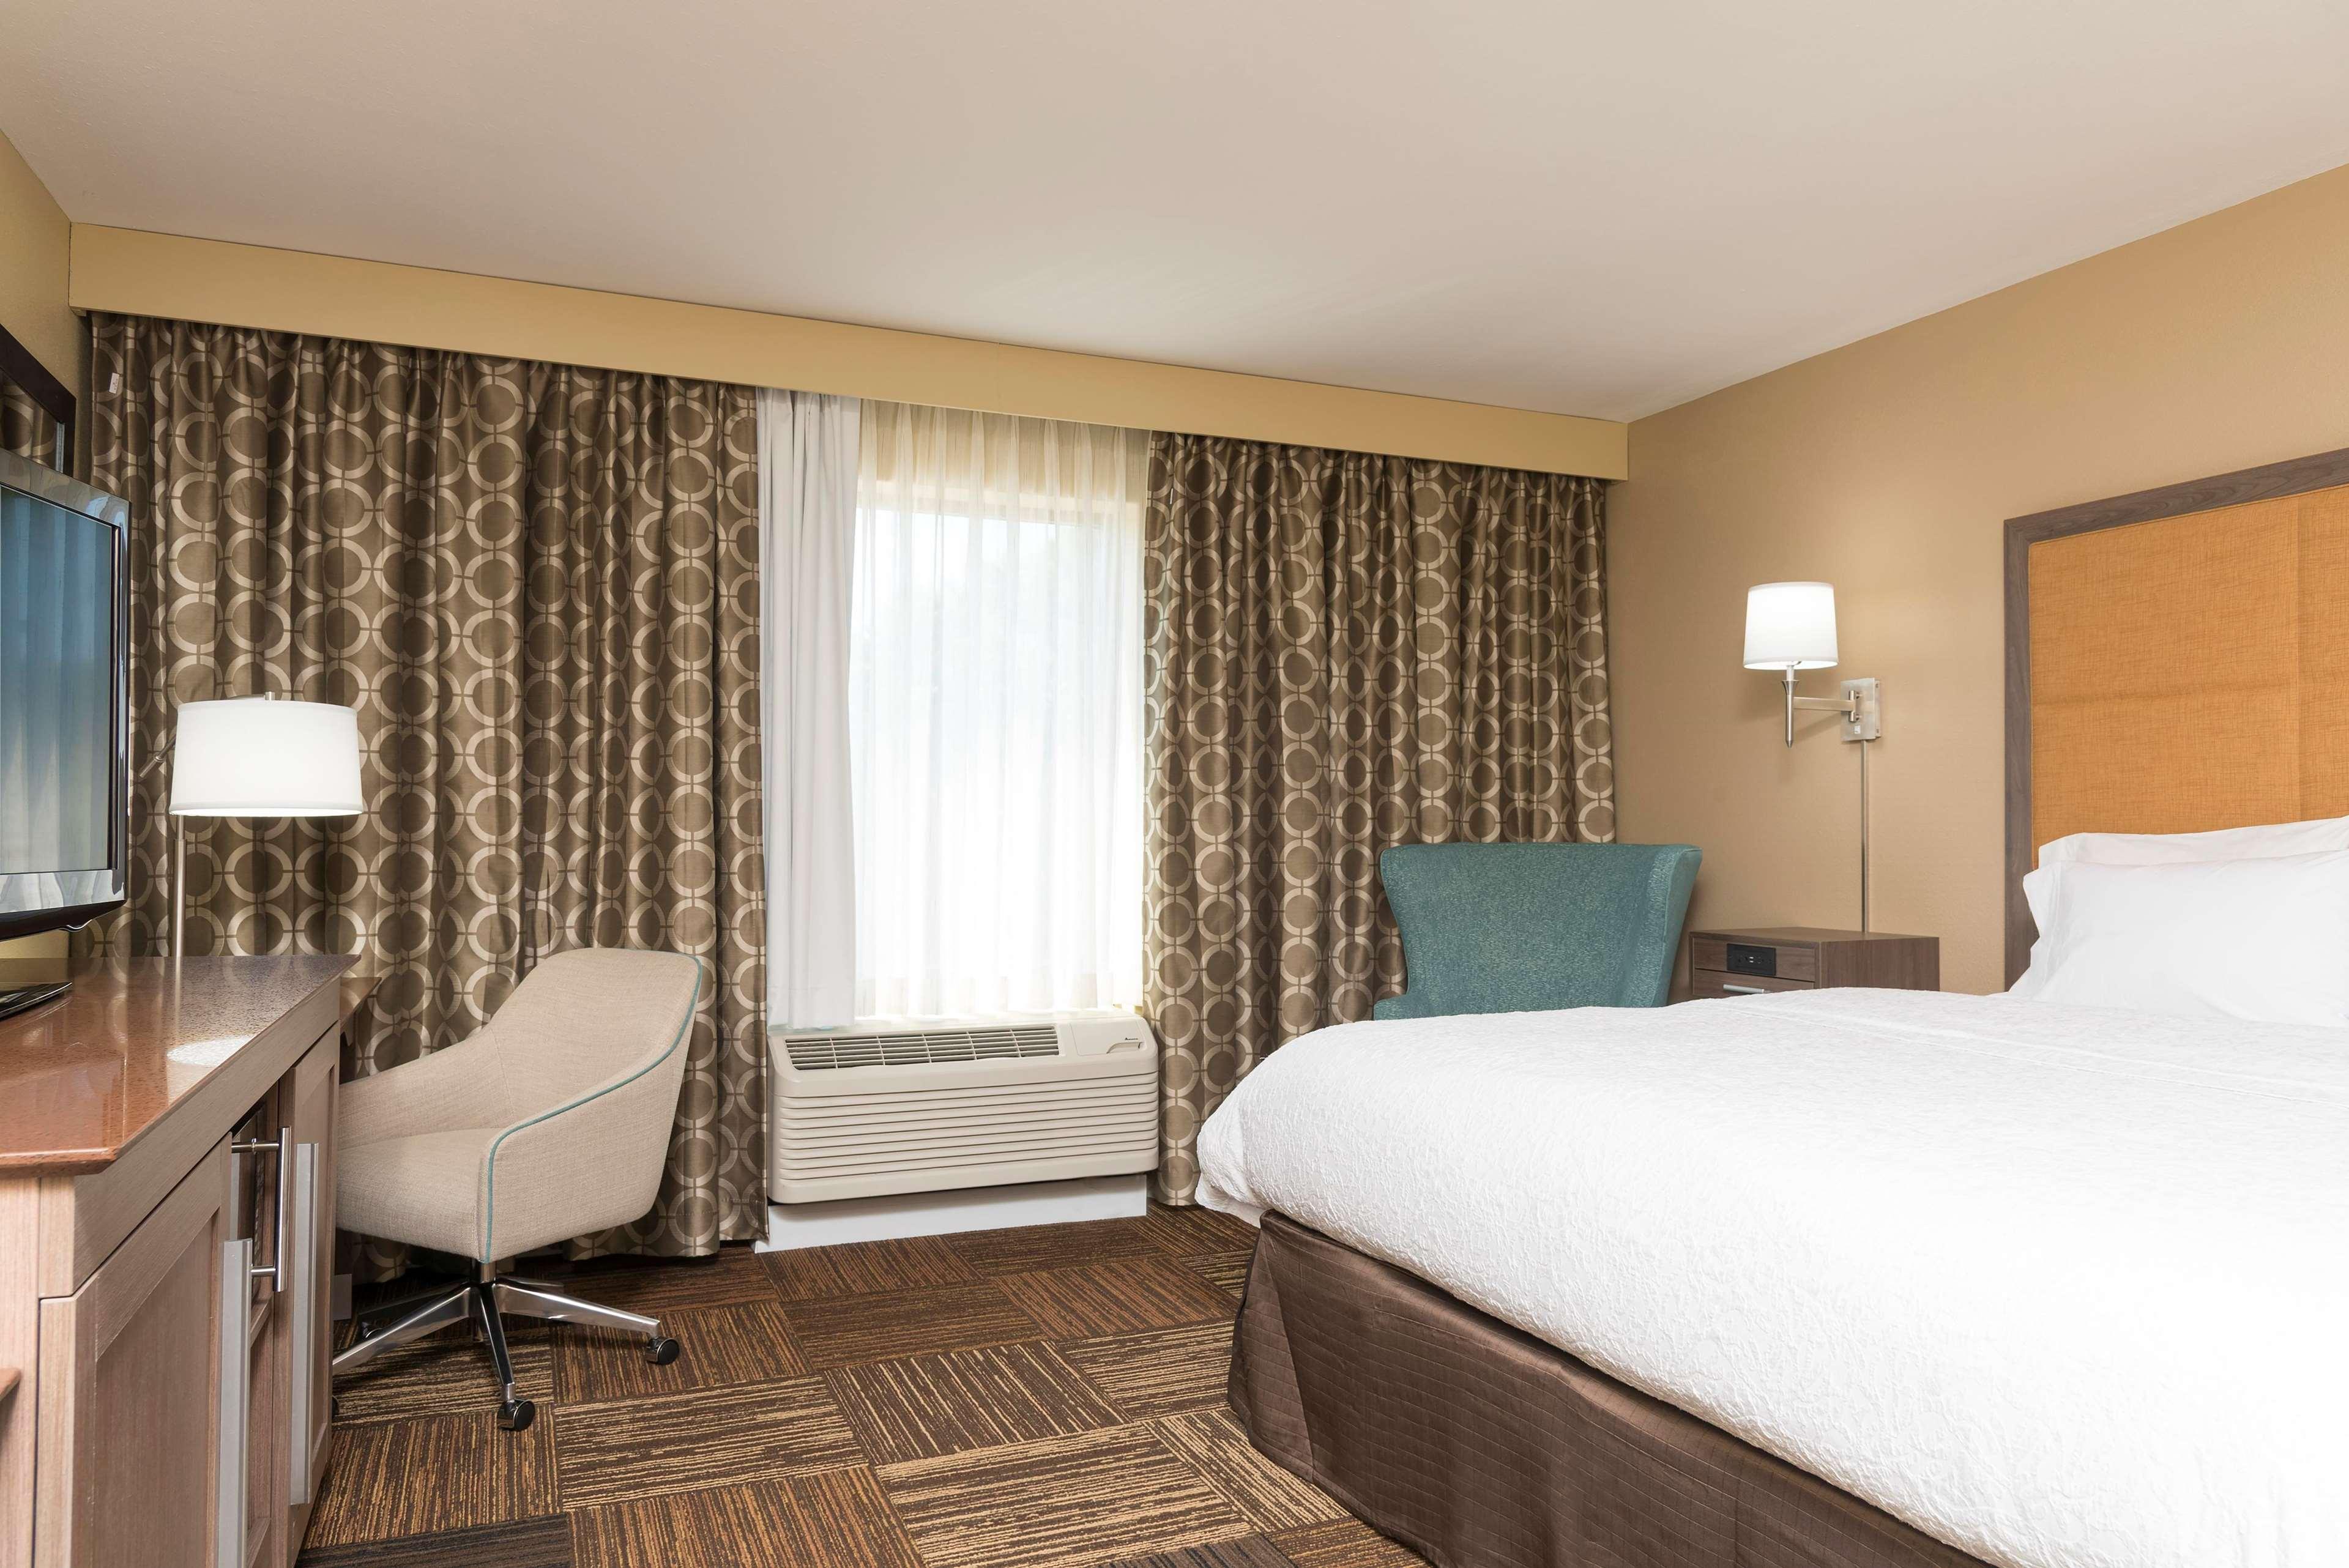 Hampton Inn & Suites Mansfield-South @ I-71 image 27